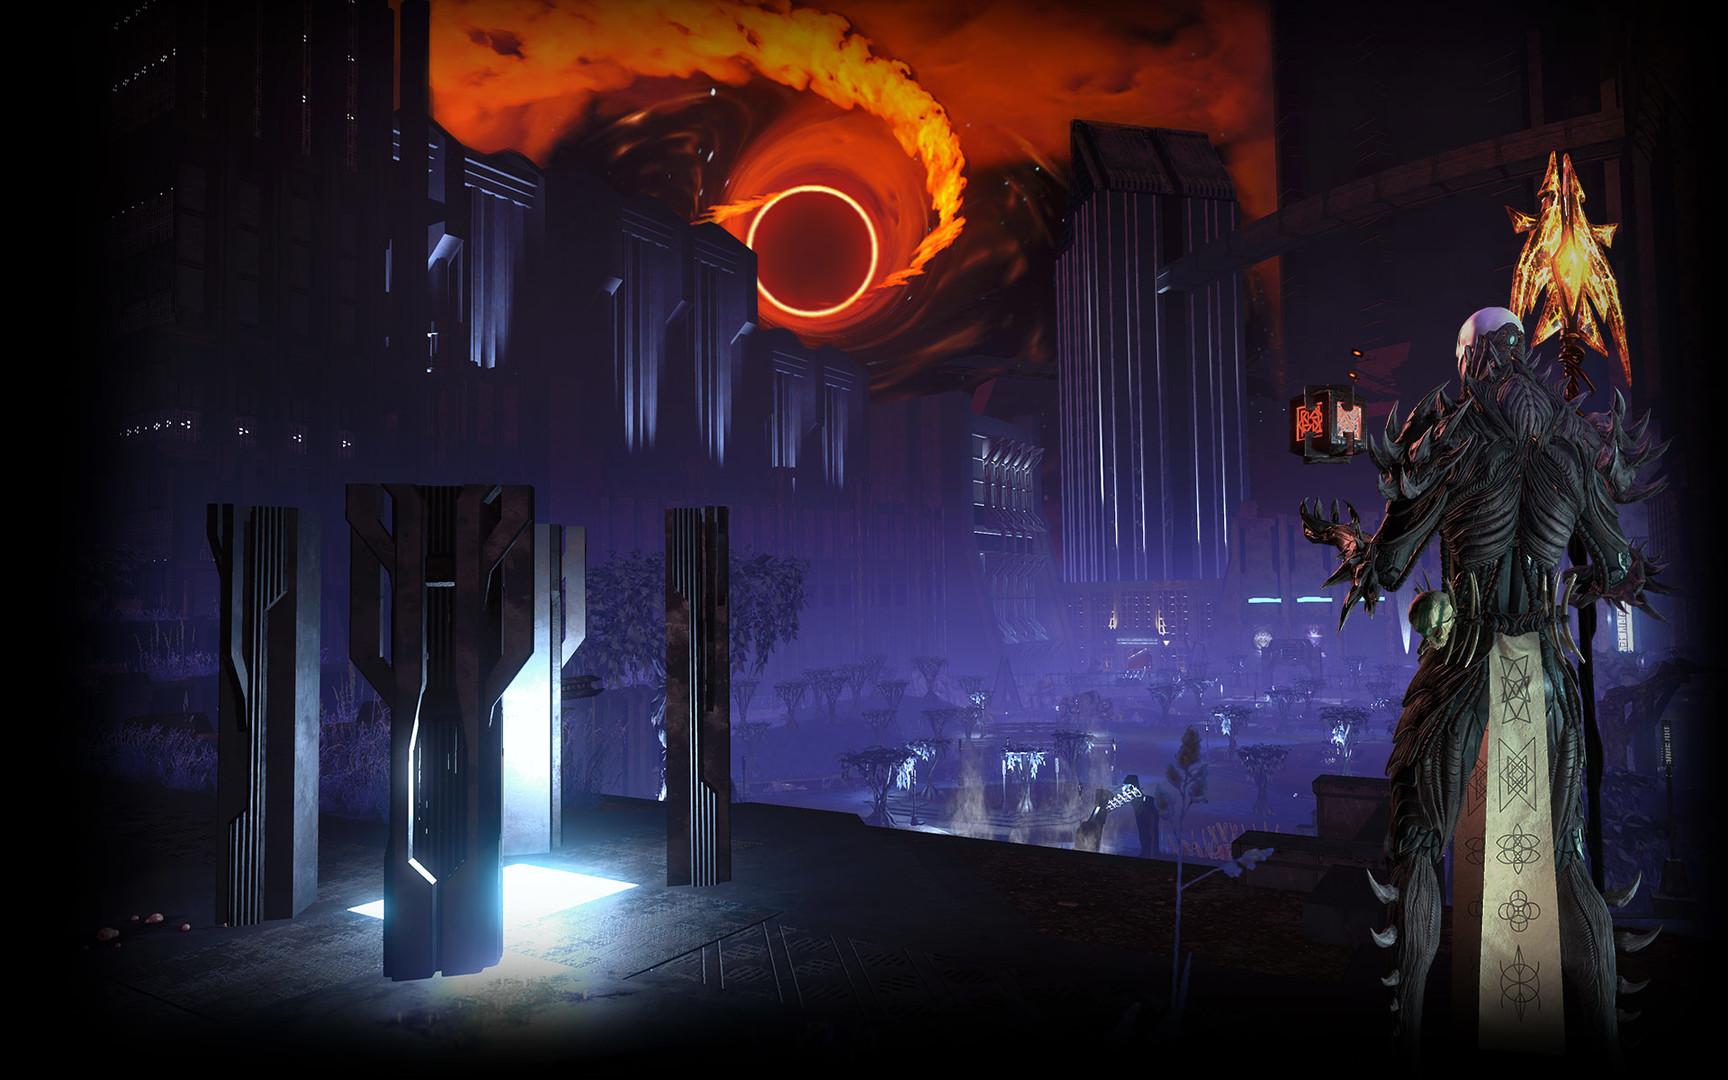 Sci Fi Horror Game Hellpoint Delayed By Coronavirus